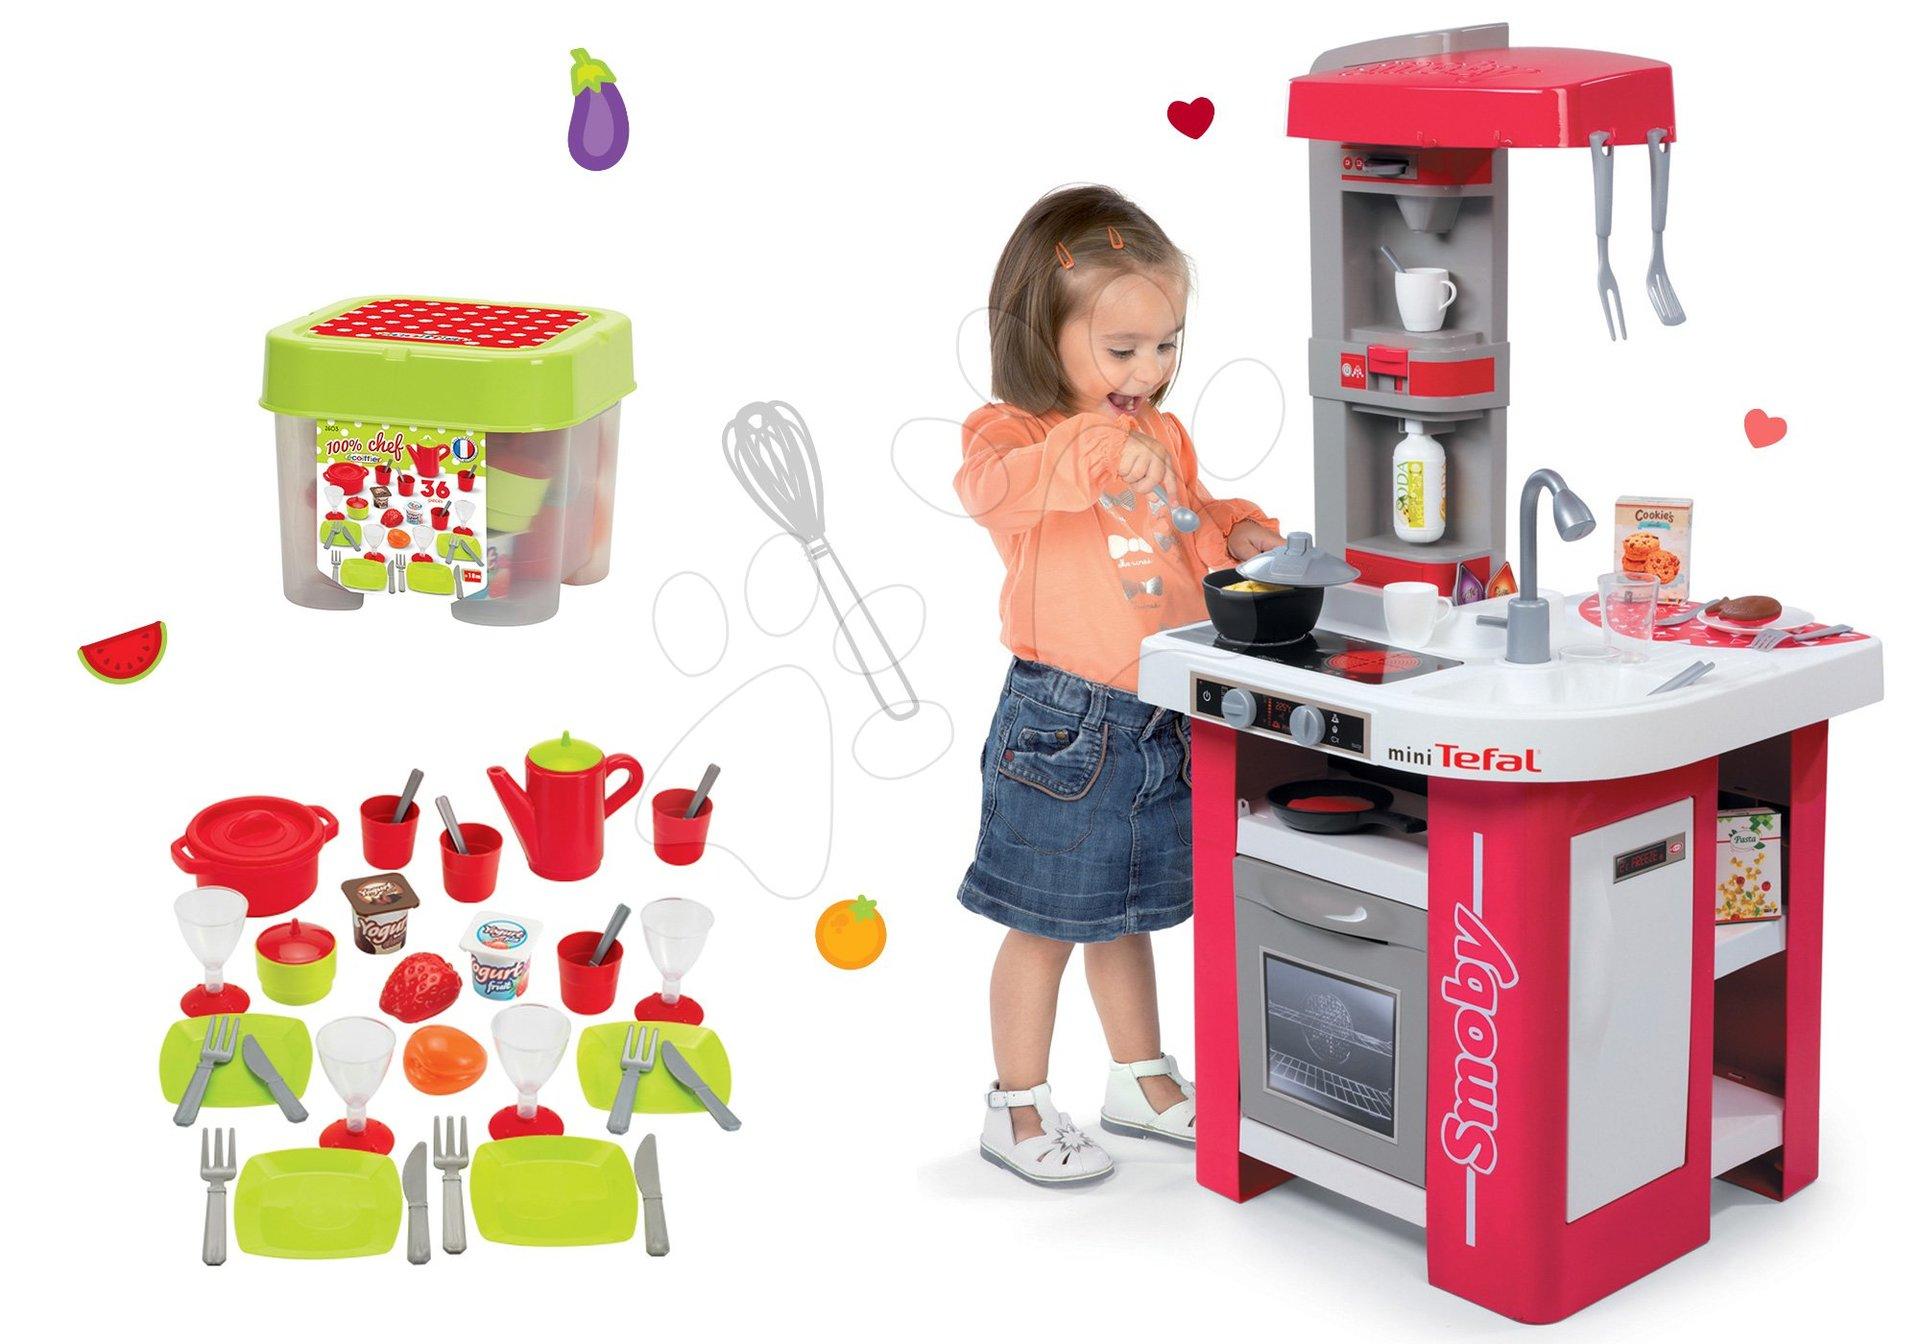 Set Smoby detská kuchynka Tefal Studio a obedová súprava s doplnkami 311022-5